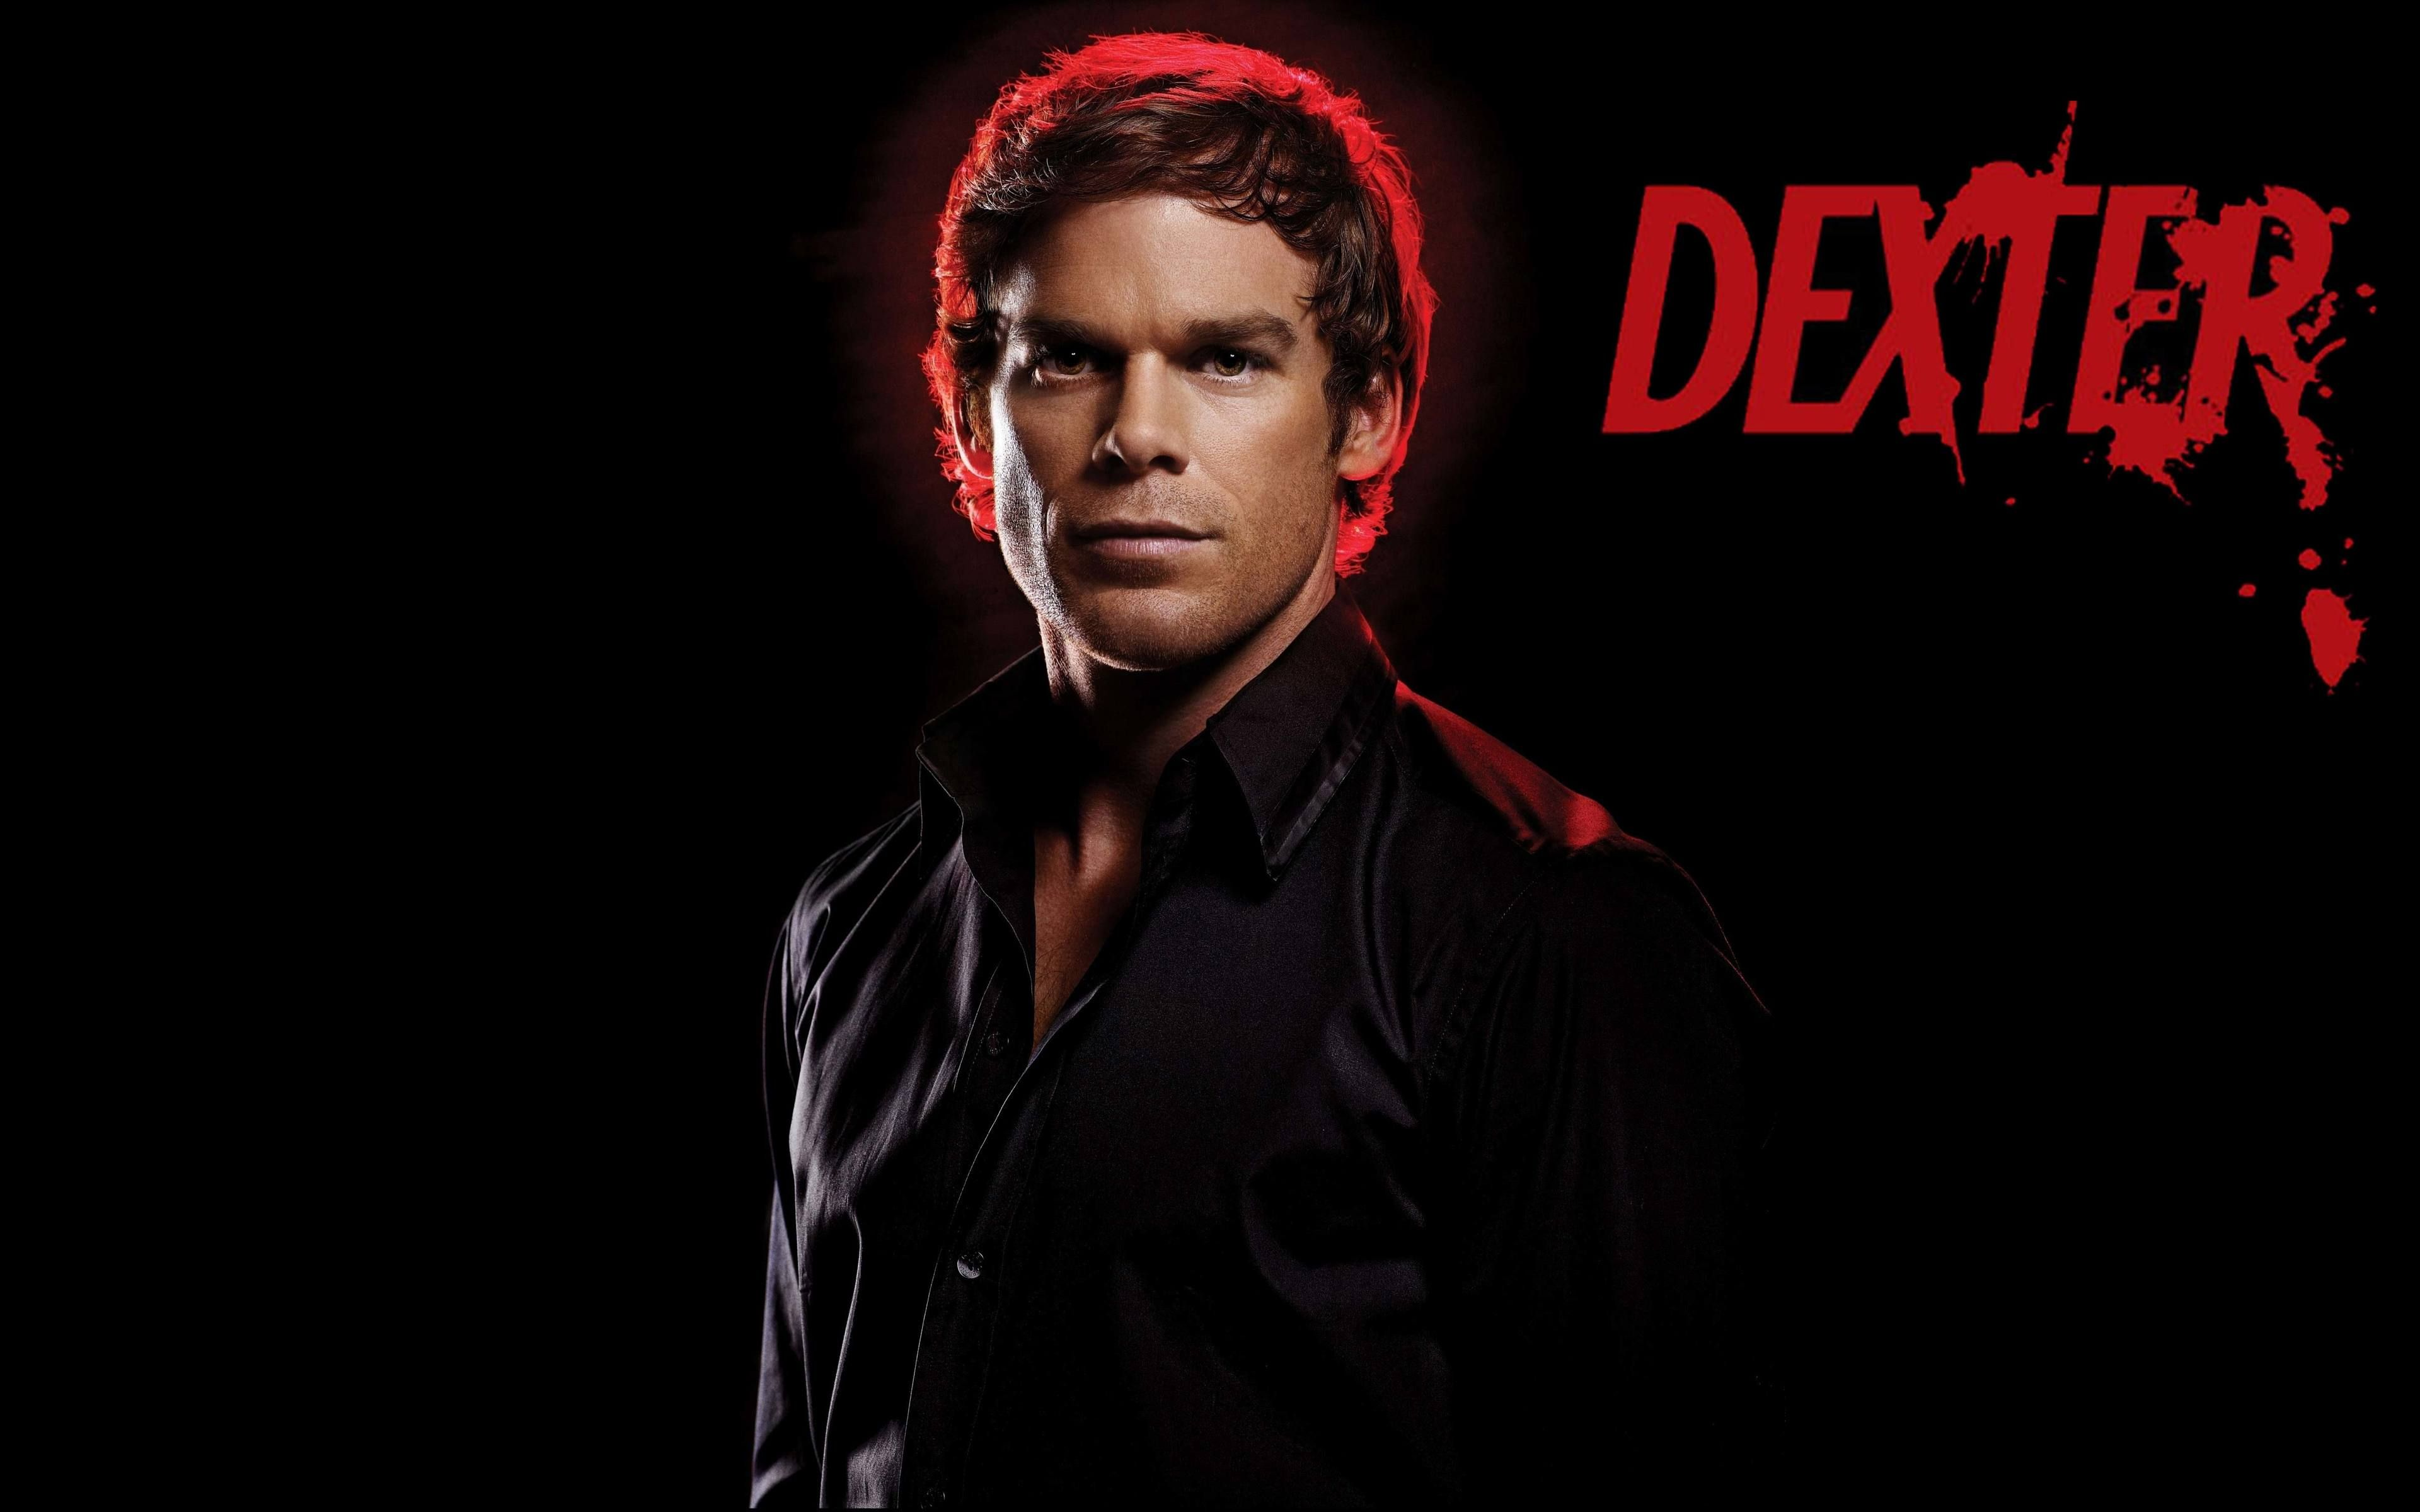 Dexter 4k Poster 2018 Movie Tv Series Michael Carlyle Hall Dexter Morgan Michael C Hall Dexter Wallpaper